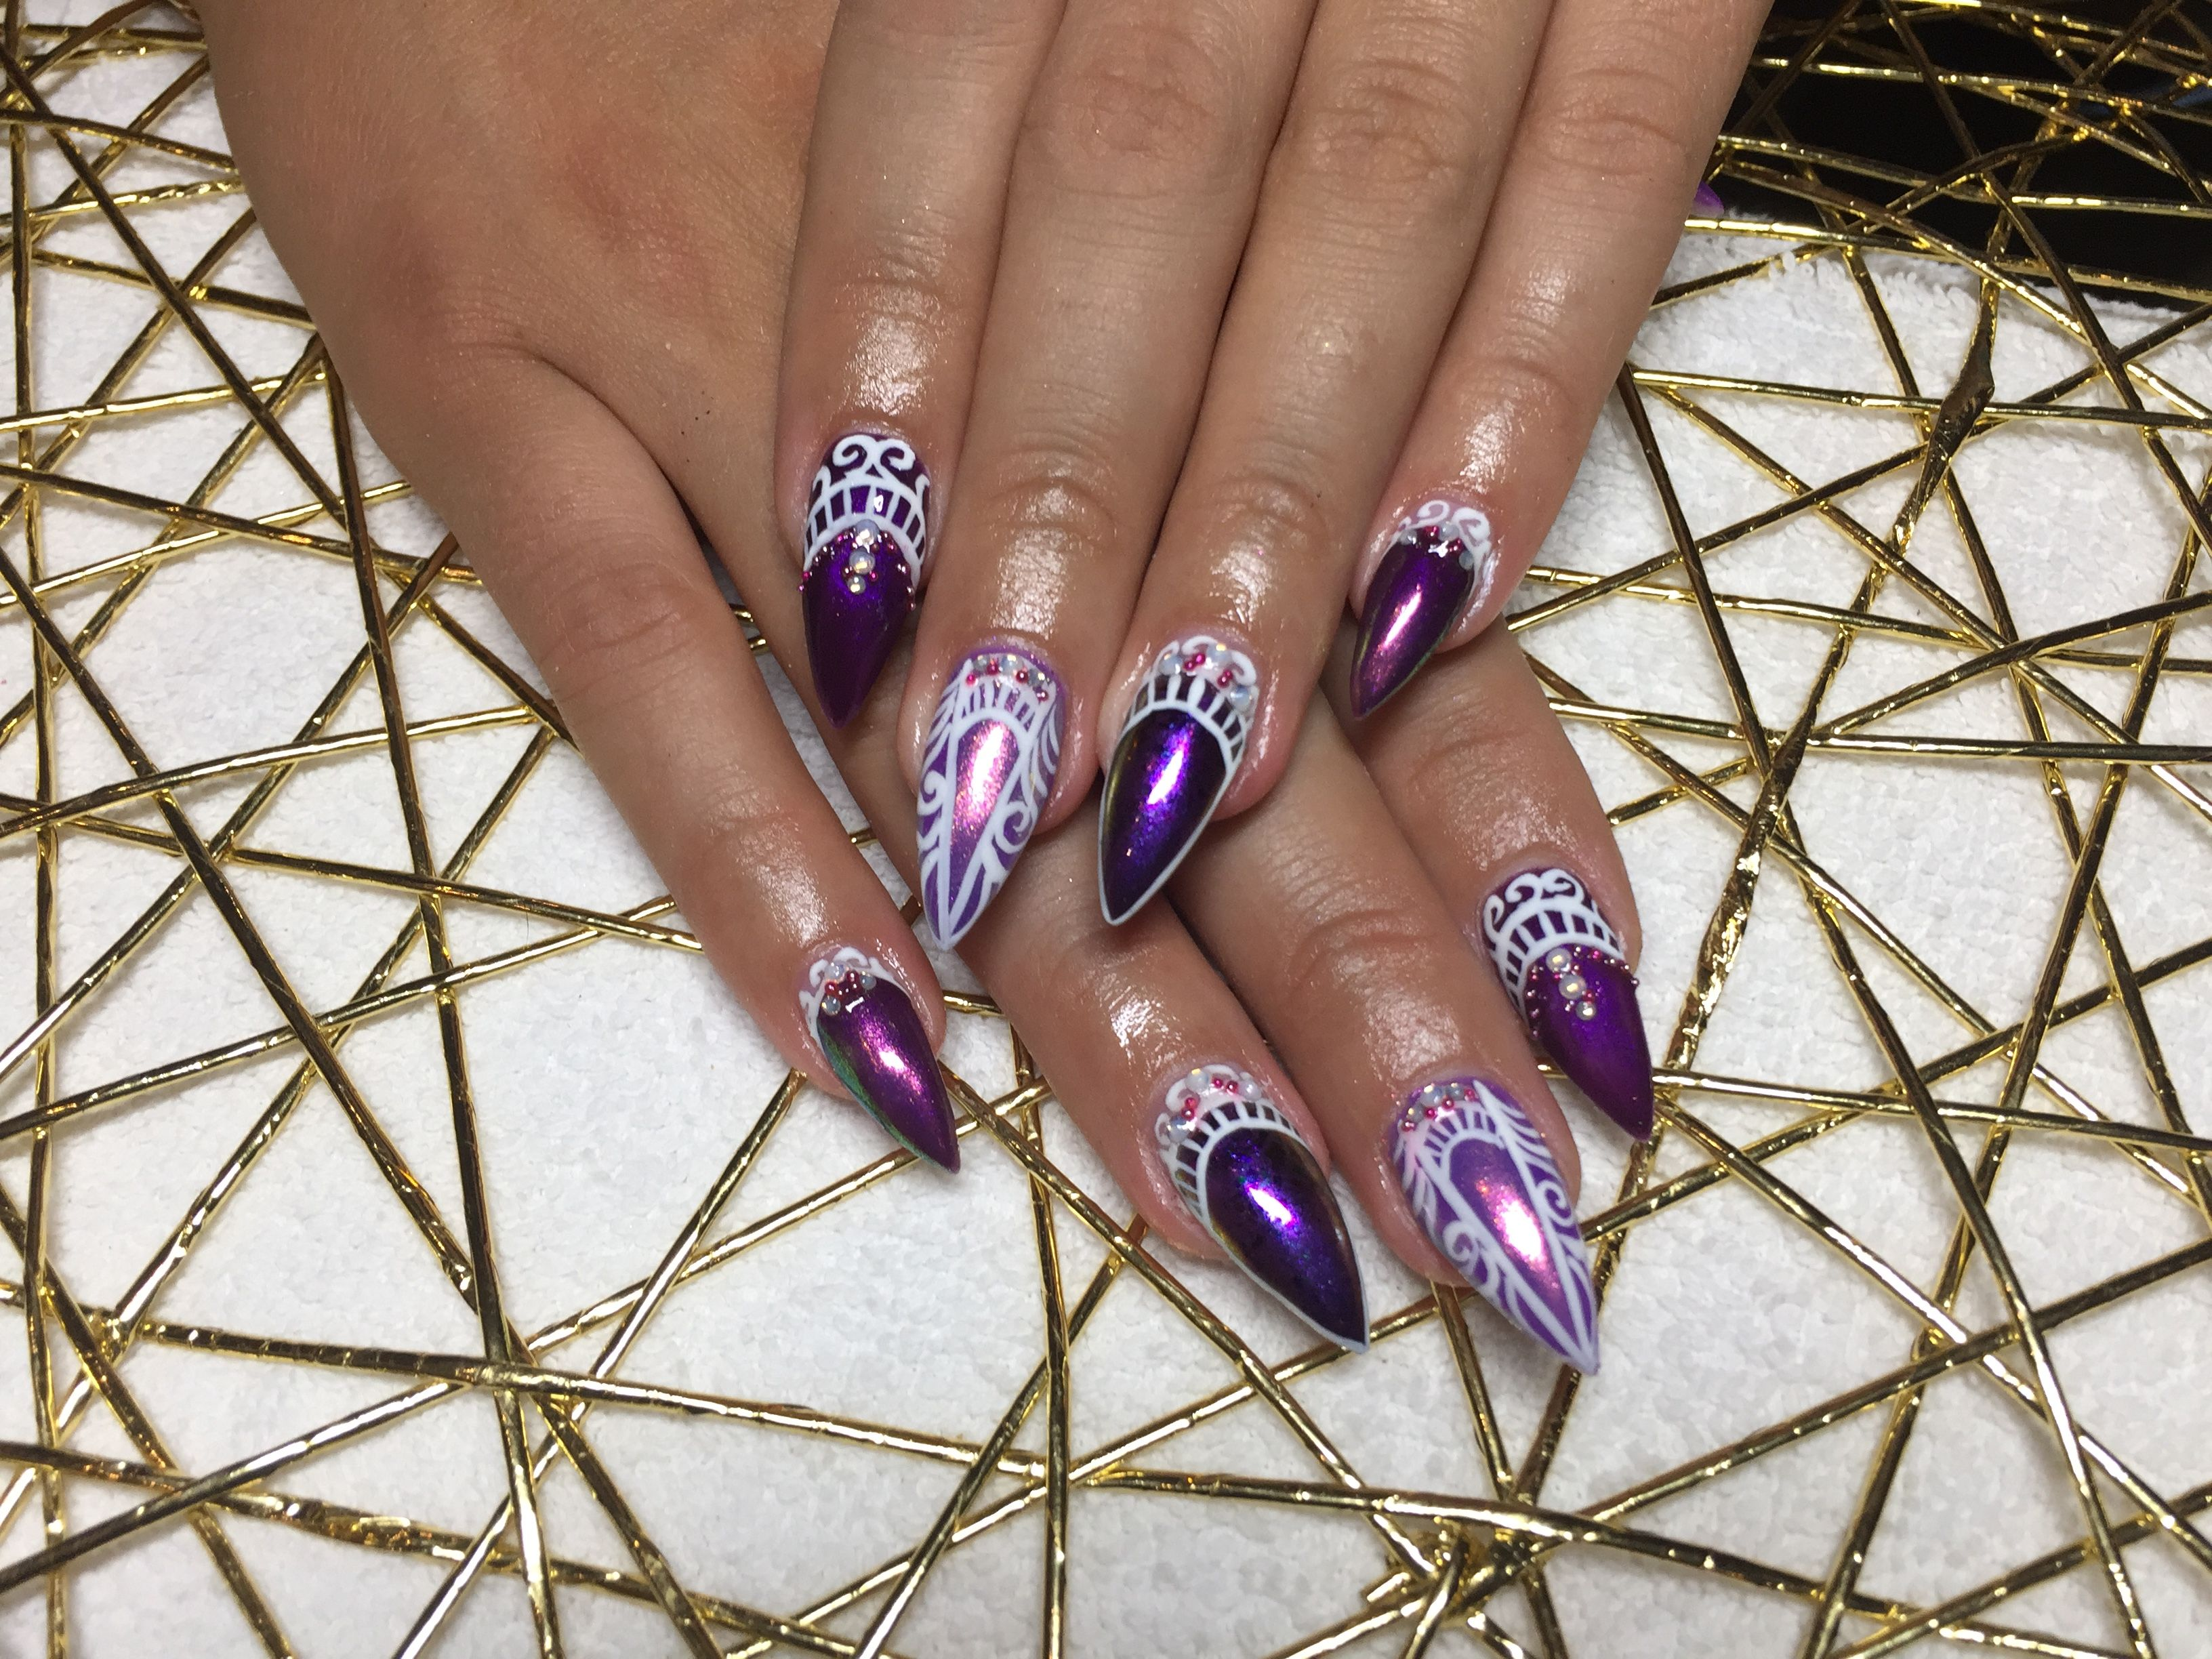 Pin by Mocadescia Fair on Nail Art | Pinterest | Art nails, Exotic ...